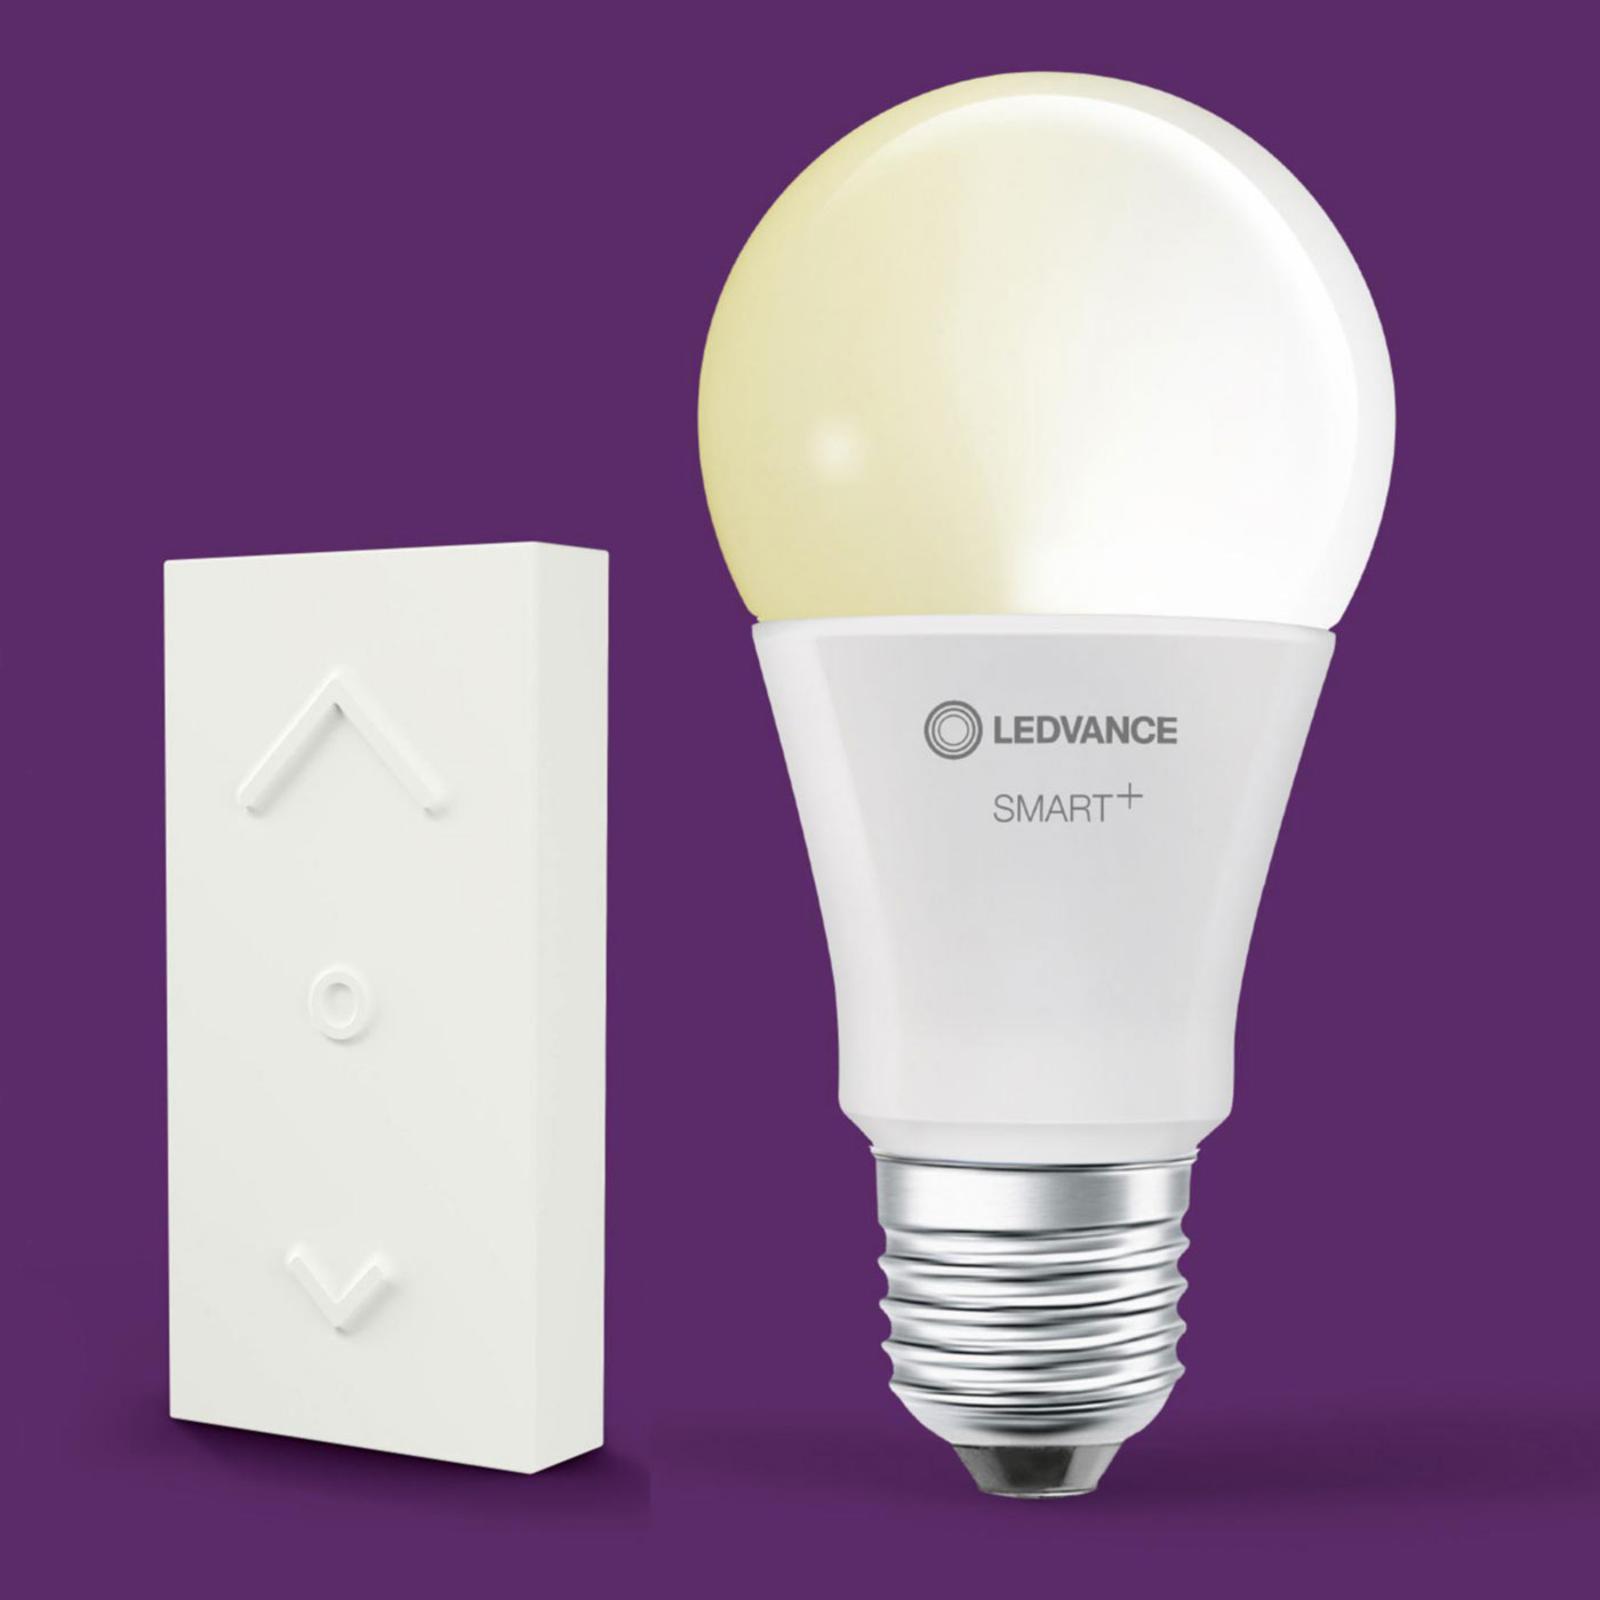 LEDVANCE SMART+ ZigBee E27 2,700K 8.5W Switch Mini_6106240_1